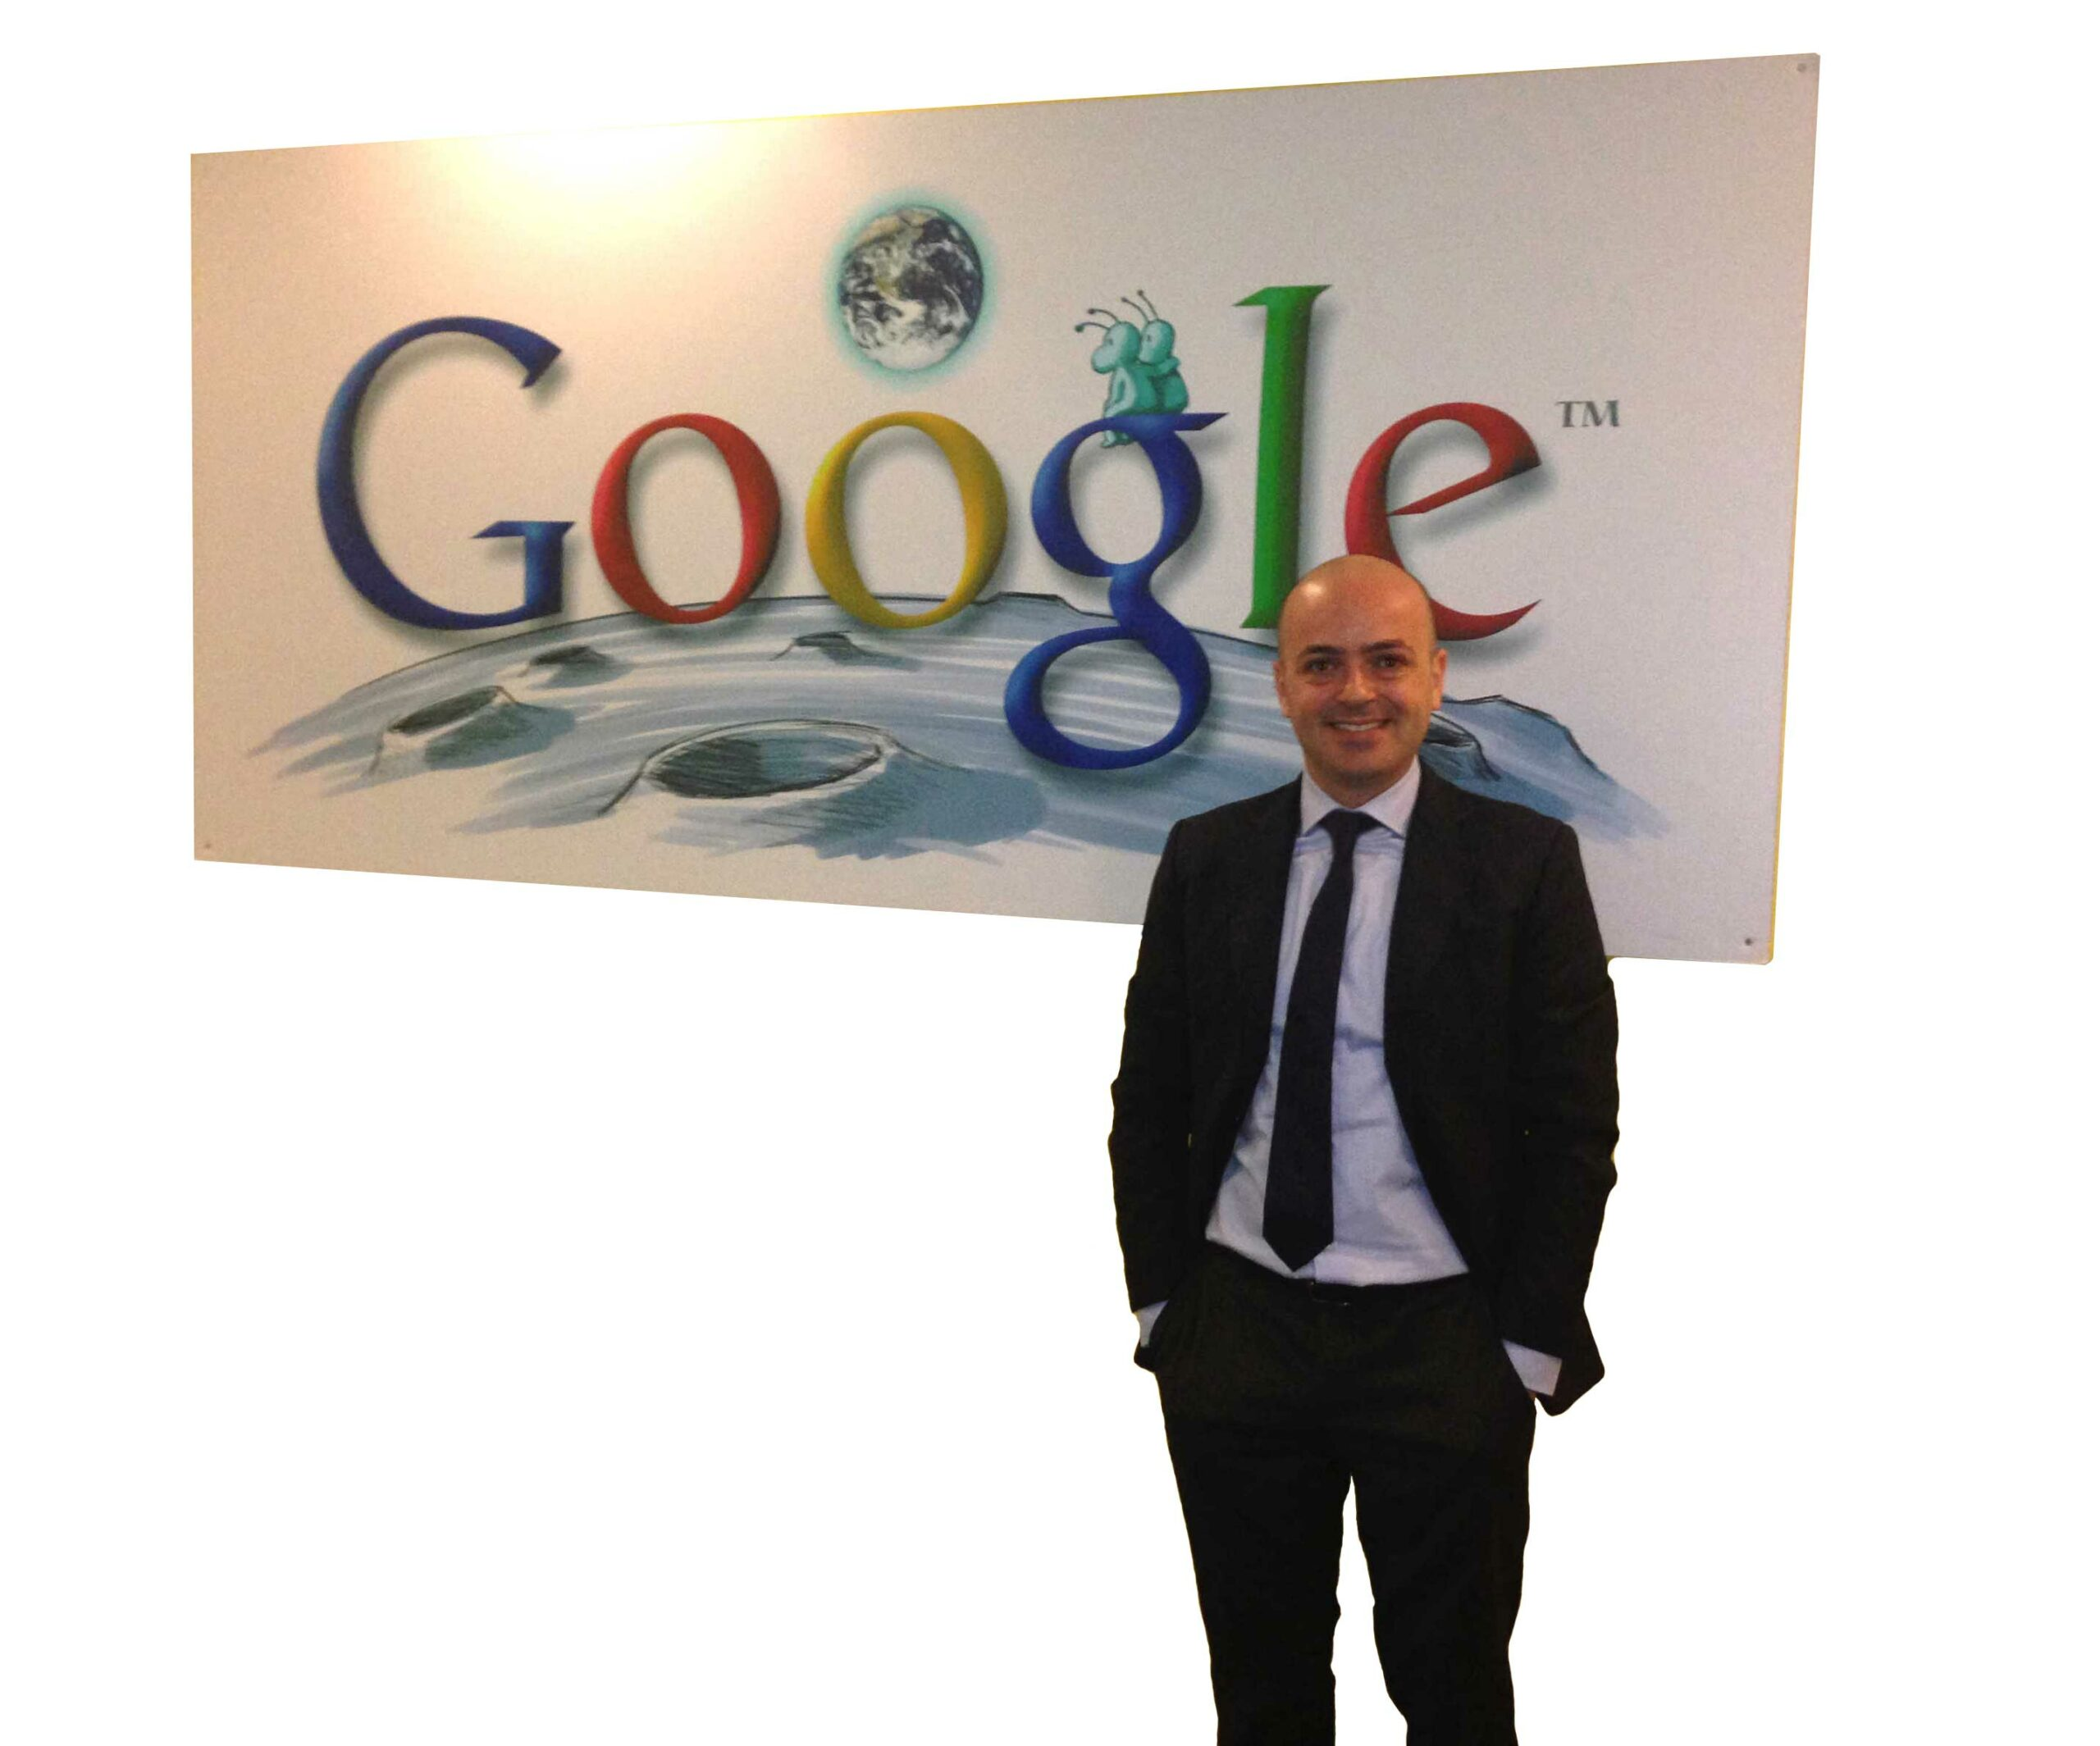 consulente google antonio giannella google partner